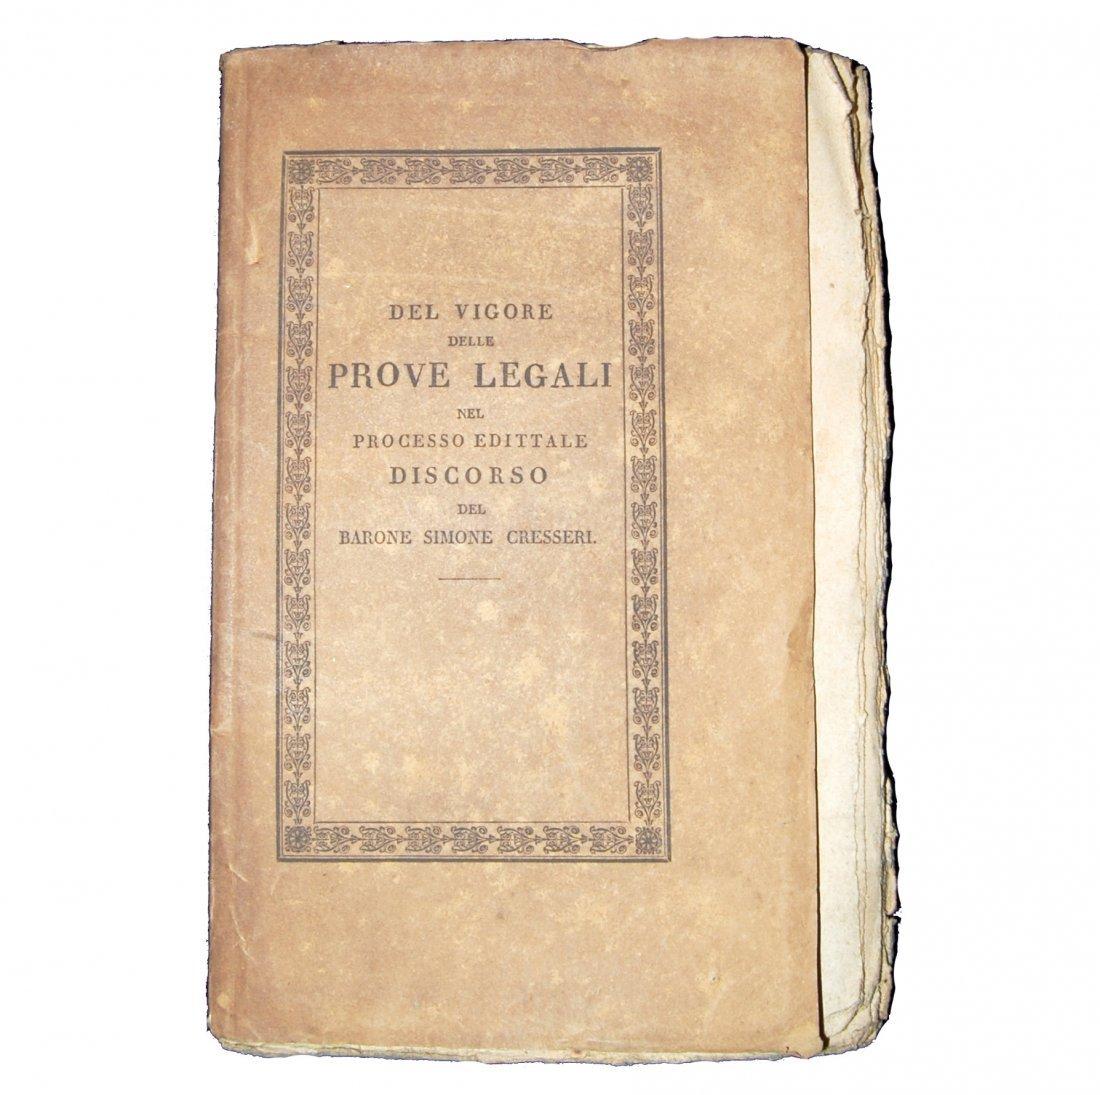 [Austria, Civil Code] Cresseri, Prove legali, 1825